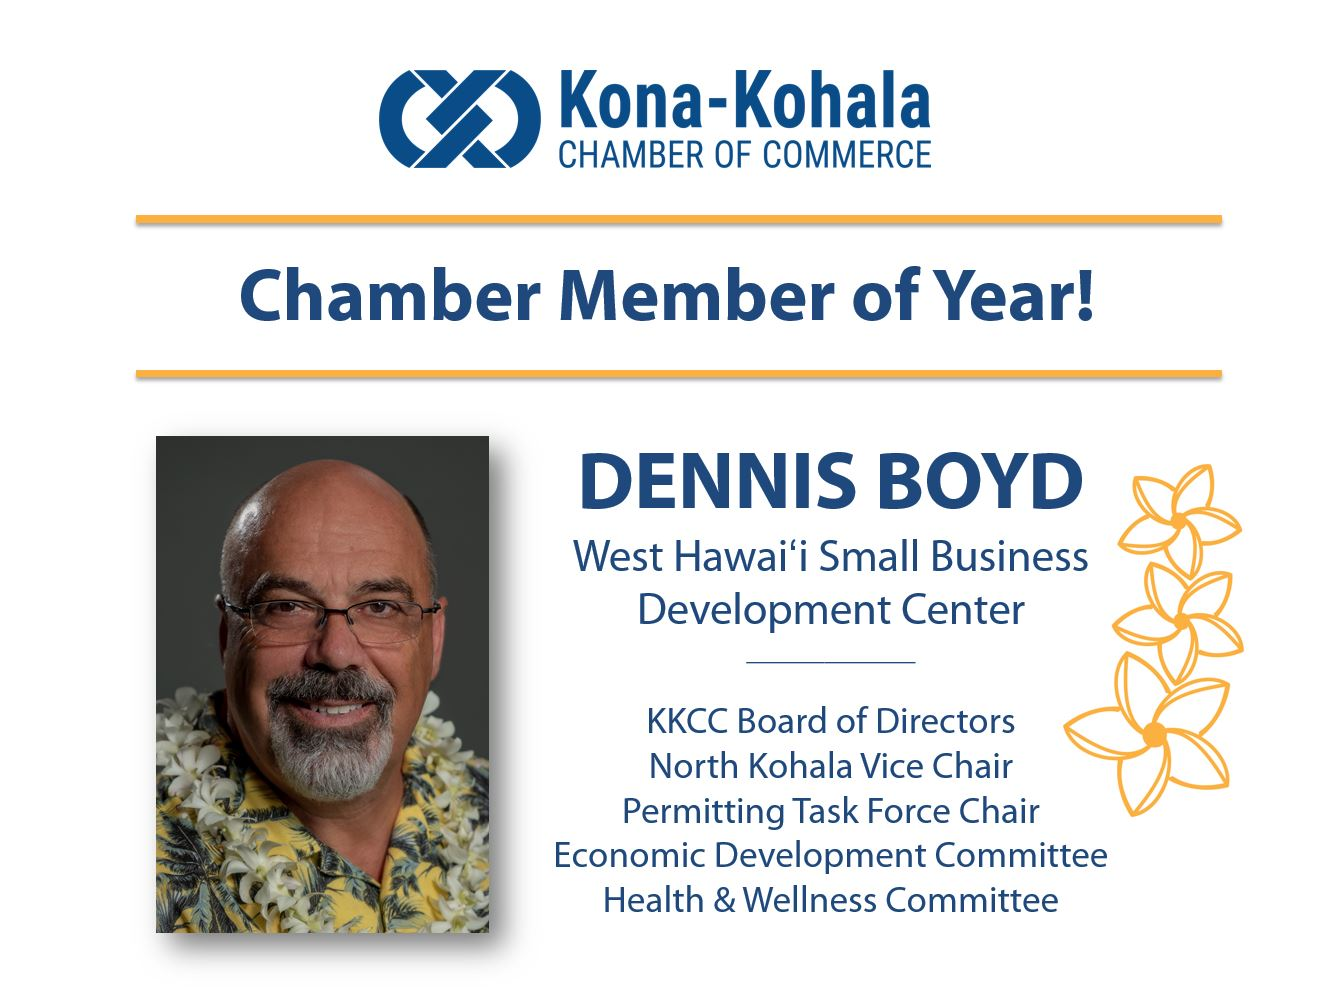 Dennis-Boyd---Chamber-Member-of-the-Year-2020.JPG